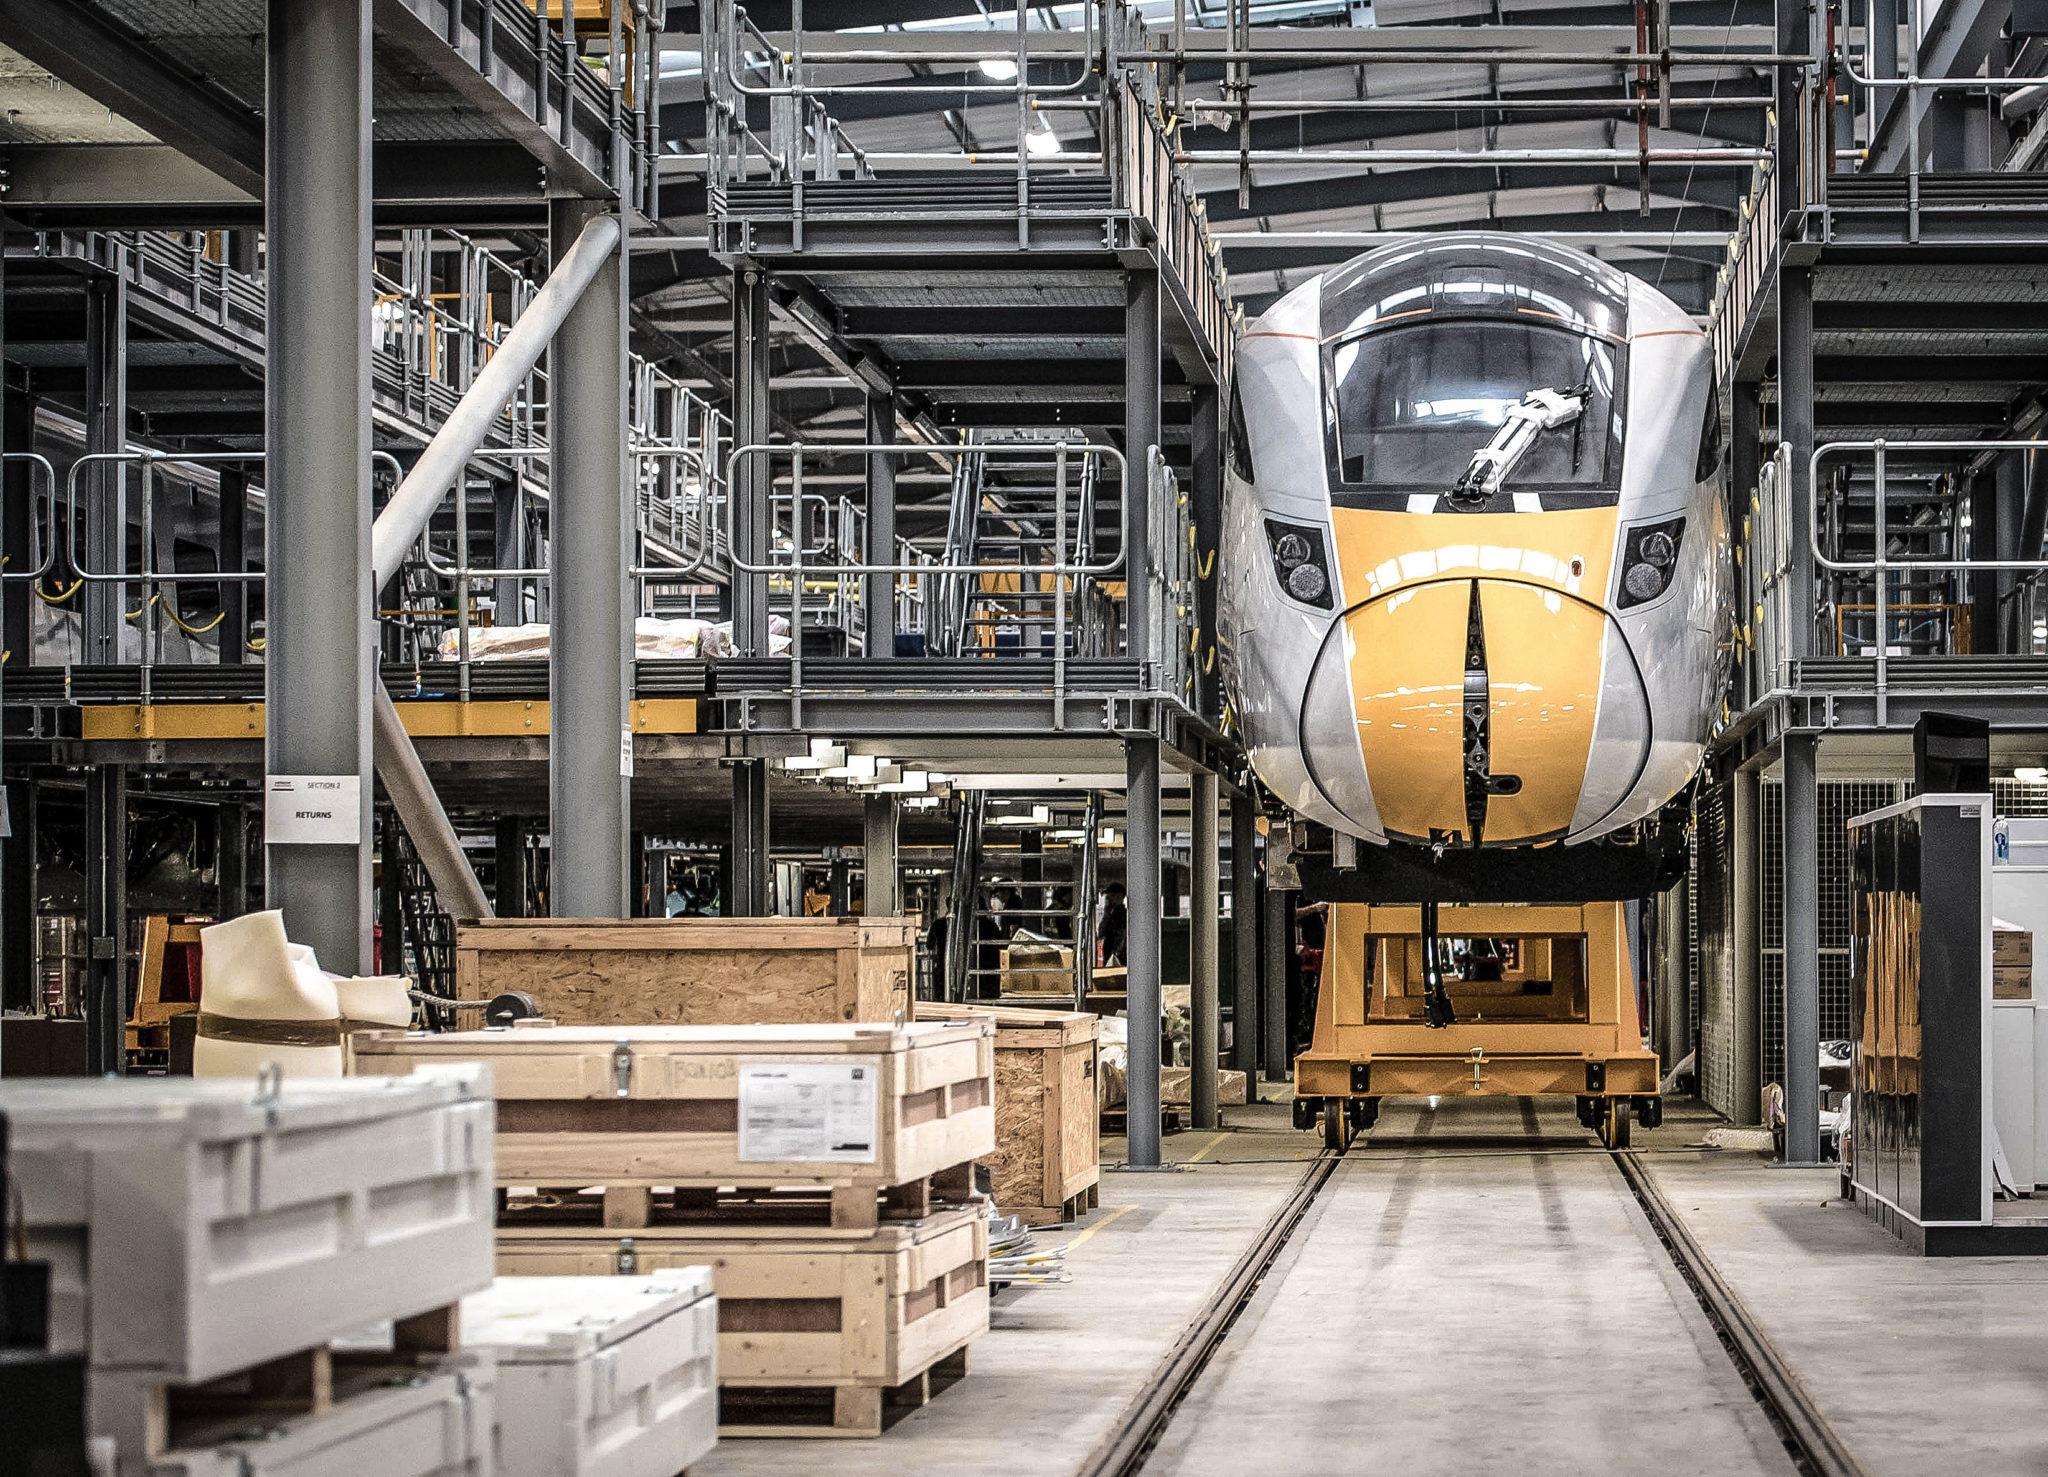 An IEP train at Hitachi's Newton Aycliffe facility